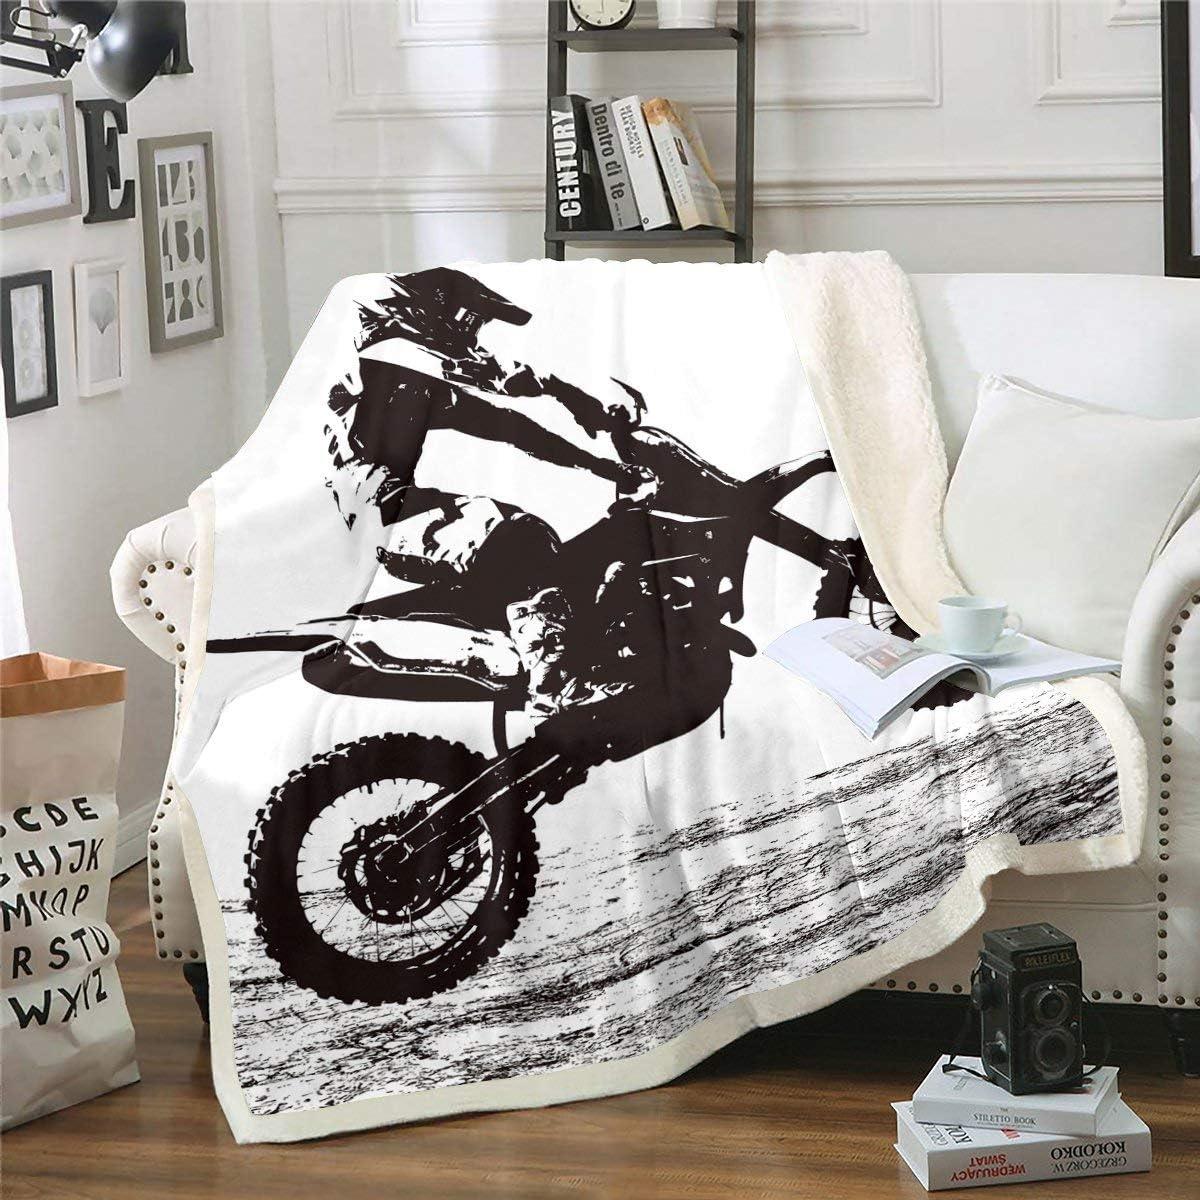 Erosebridal discount Teens Special Campaign Dirt Bike Sherpa Blanket Motocross Rider Thro